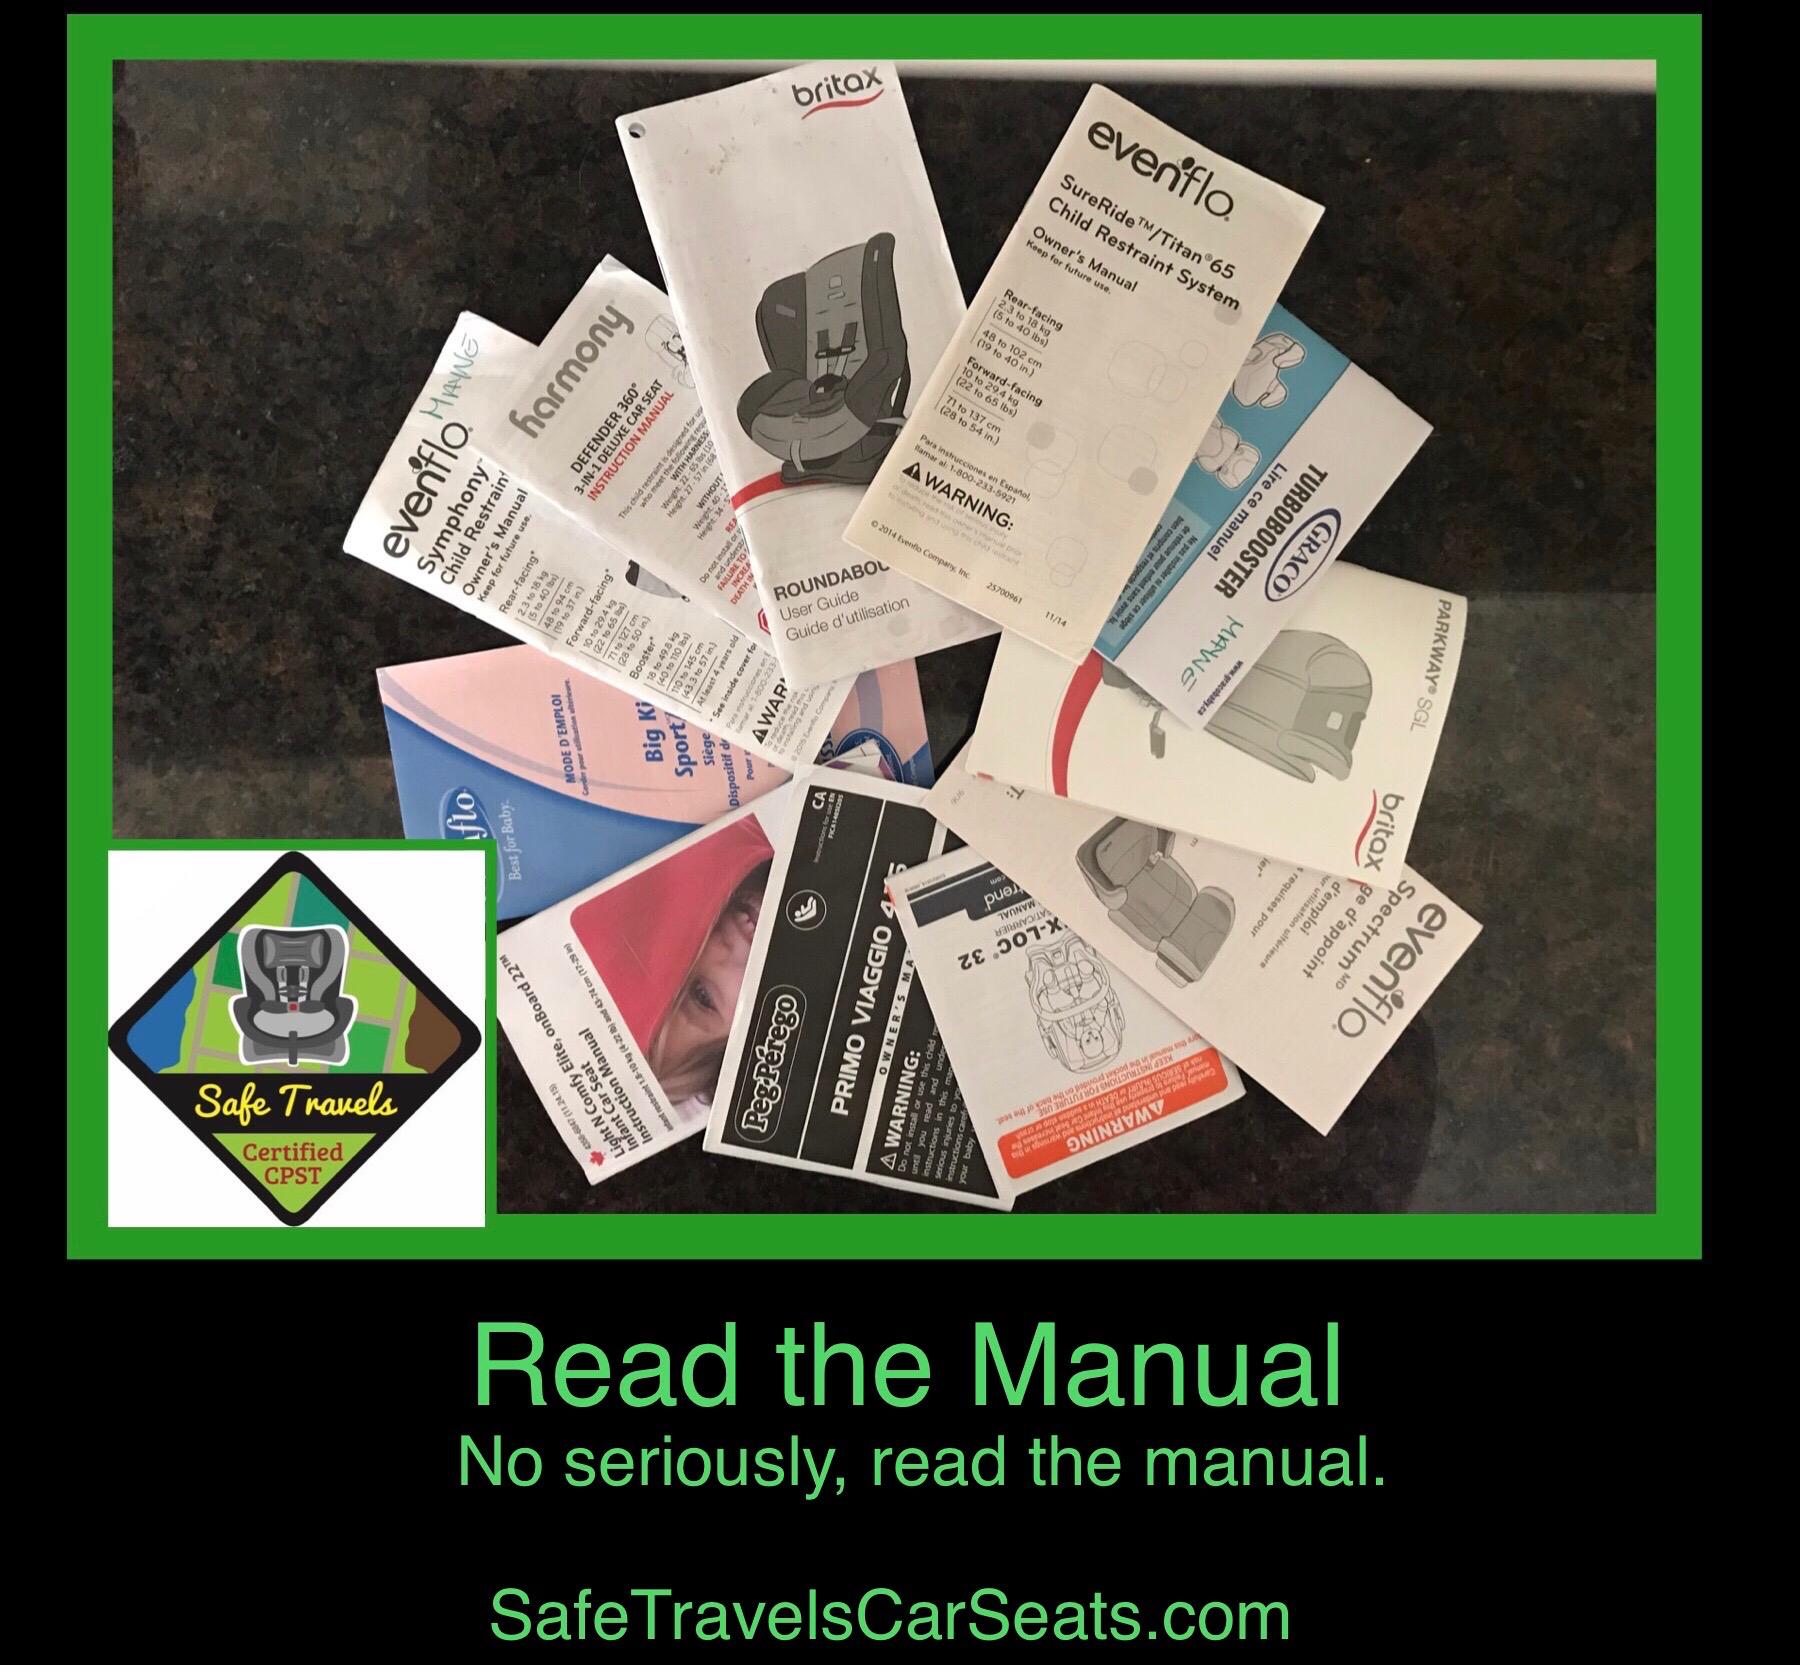 Read the manual.jpg